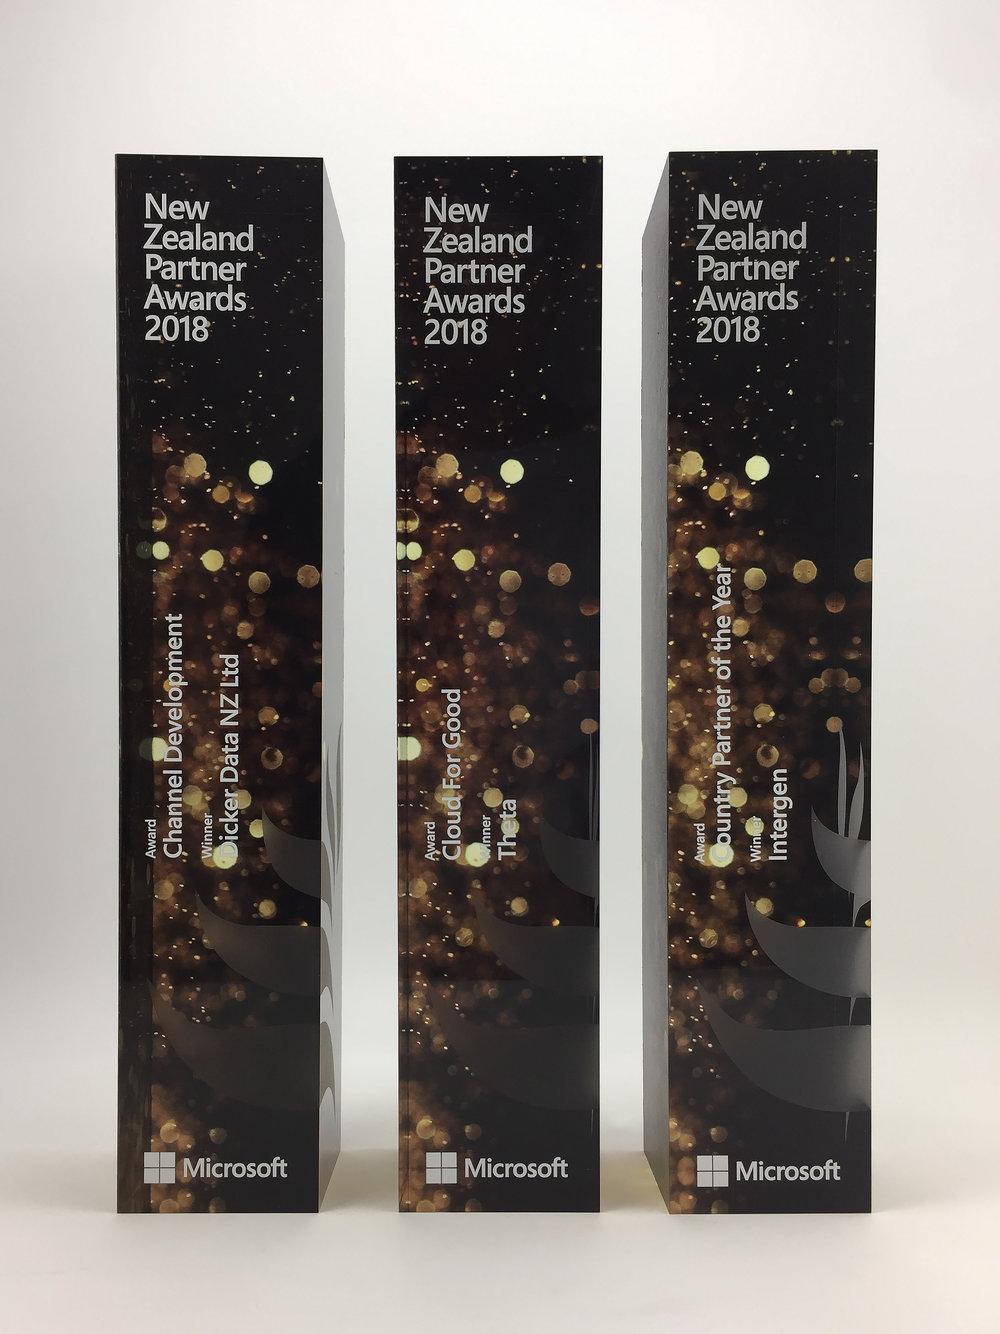 microsoft-newzealand-partner-awards-acrylic-2018-06.jpg